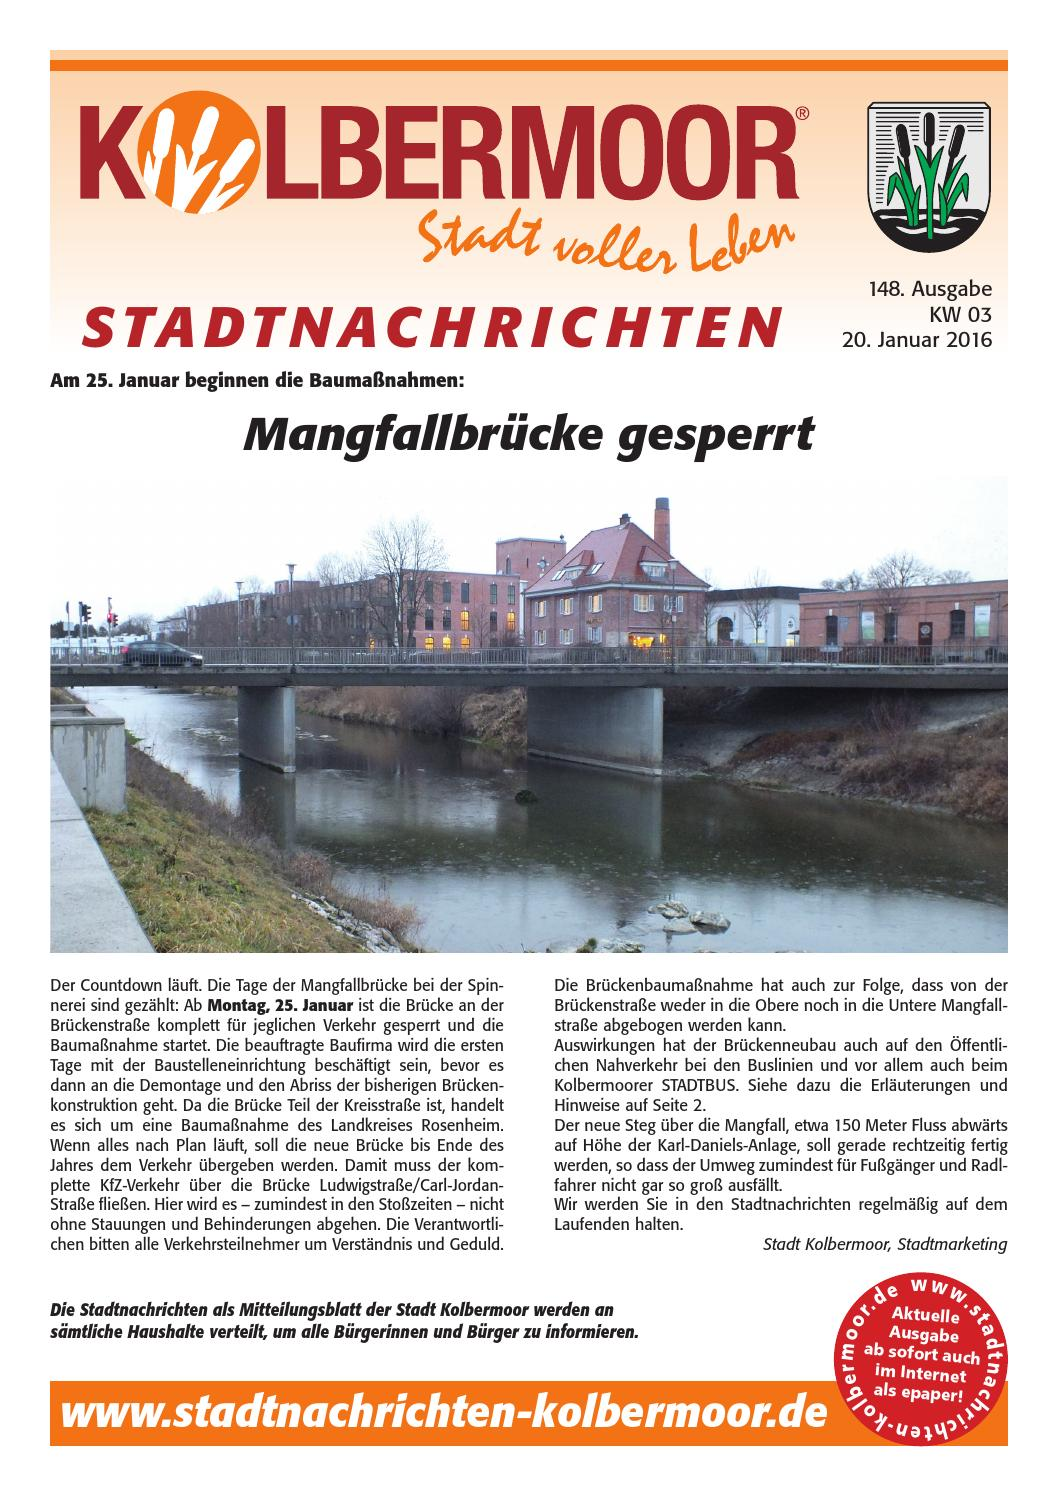 148 Stadtnachrichten Kolbermoor By Hans Peter Issuu